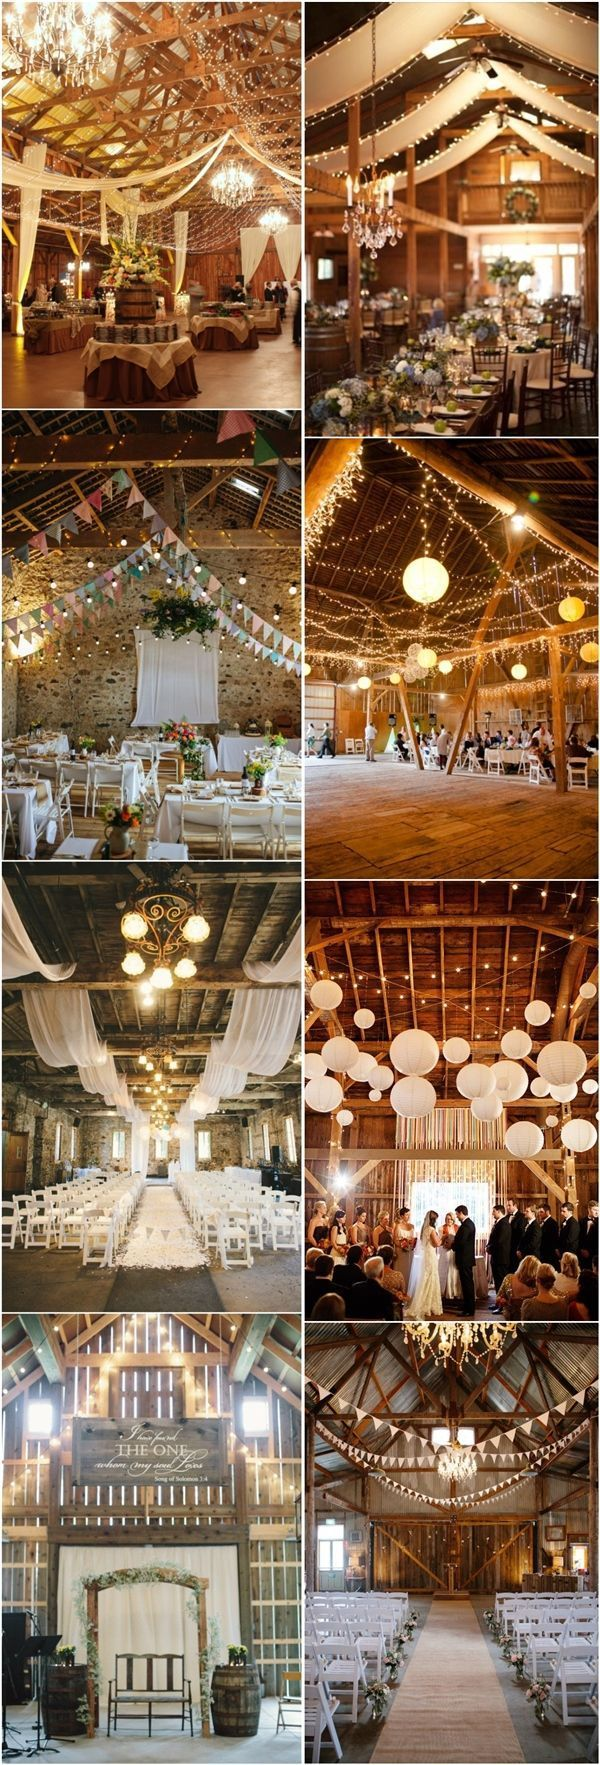 30 romantic indoor barn wedding decor ideas with lights - wedding ideas